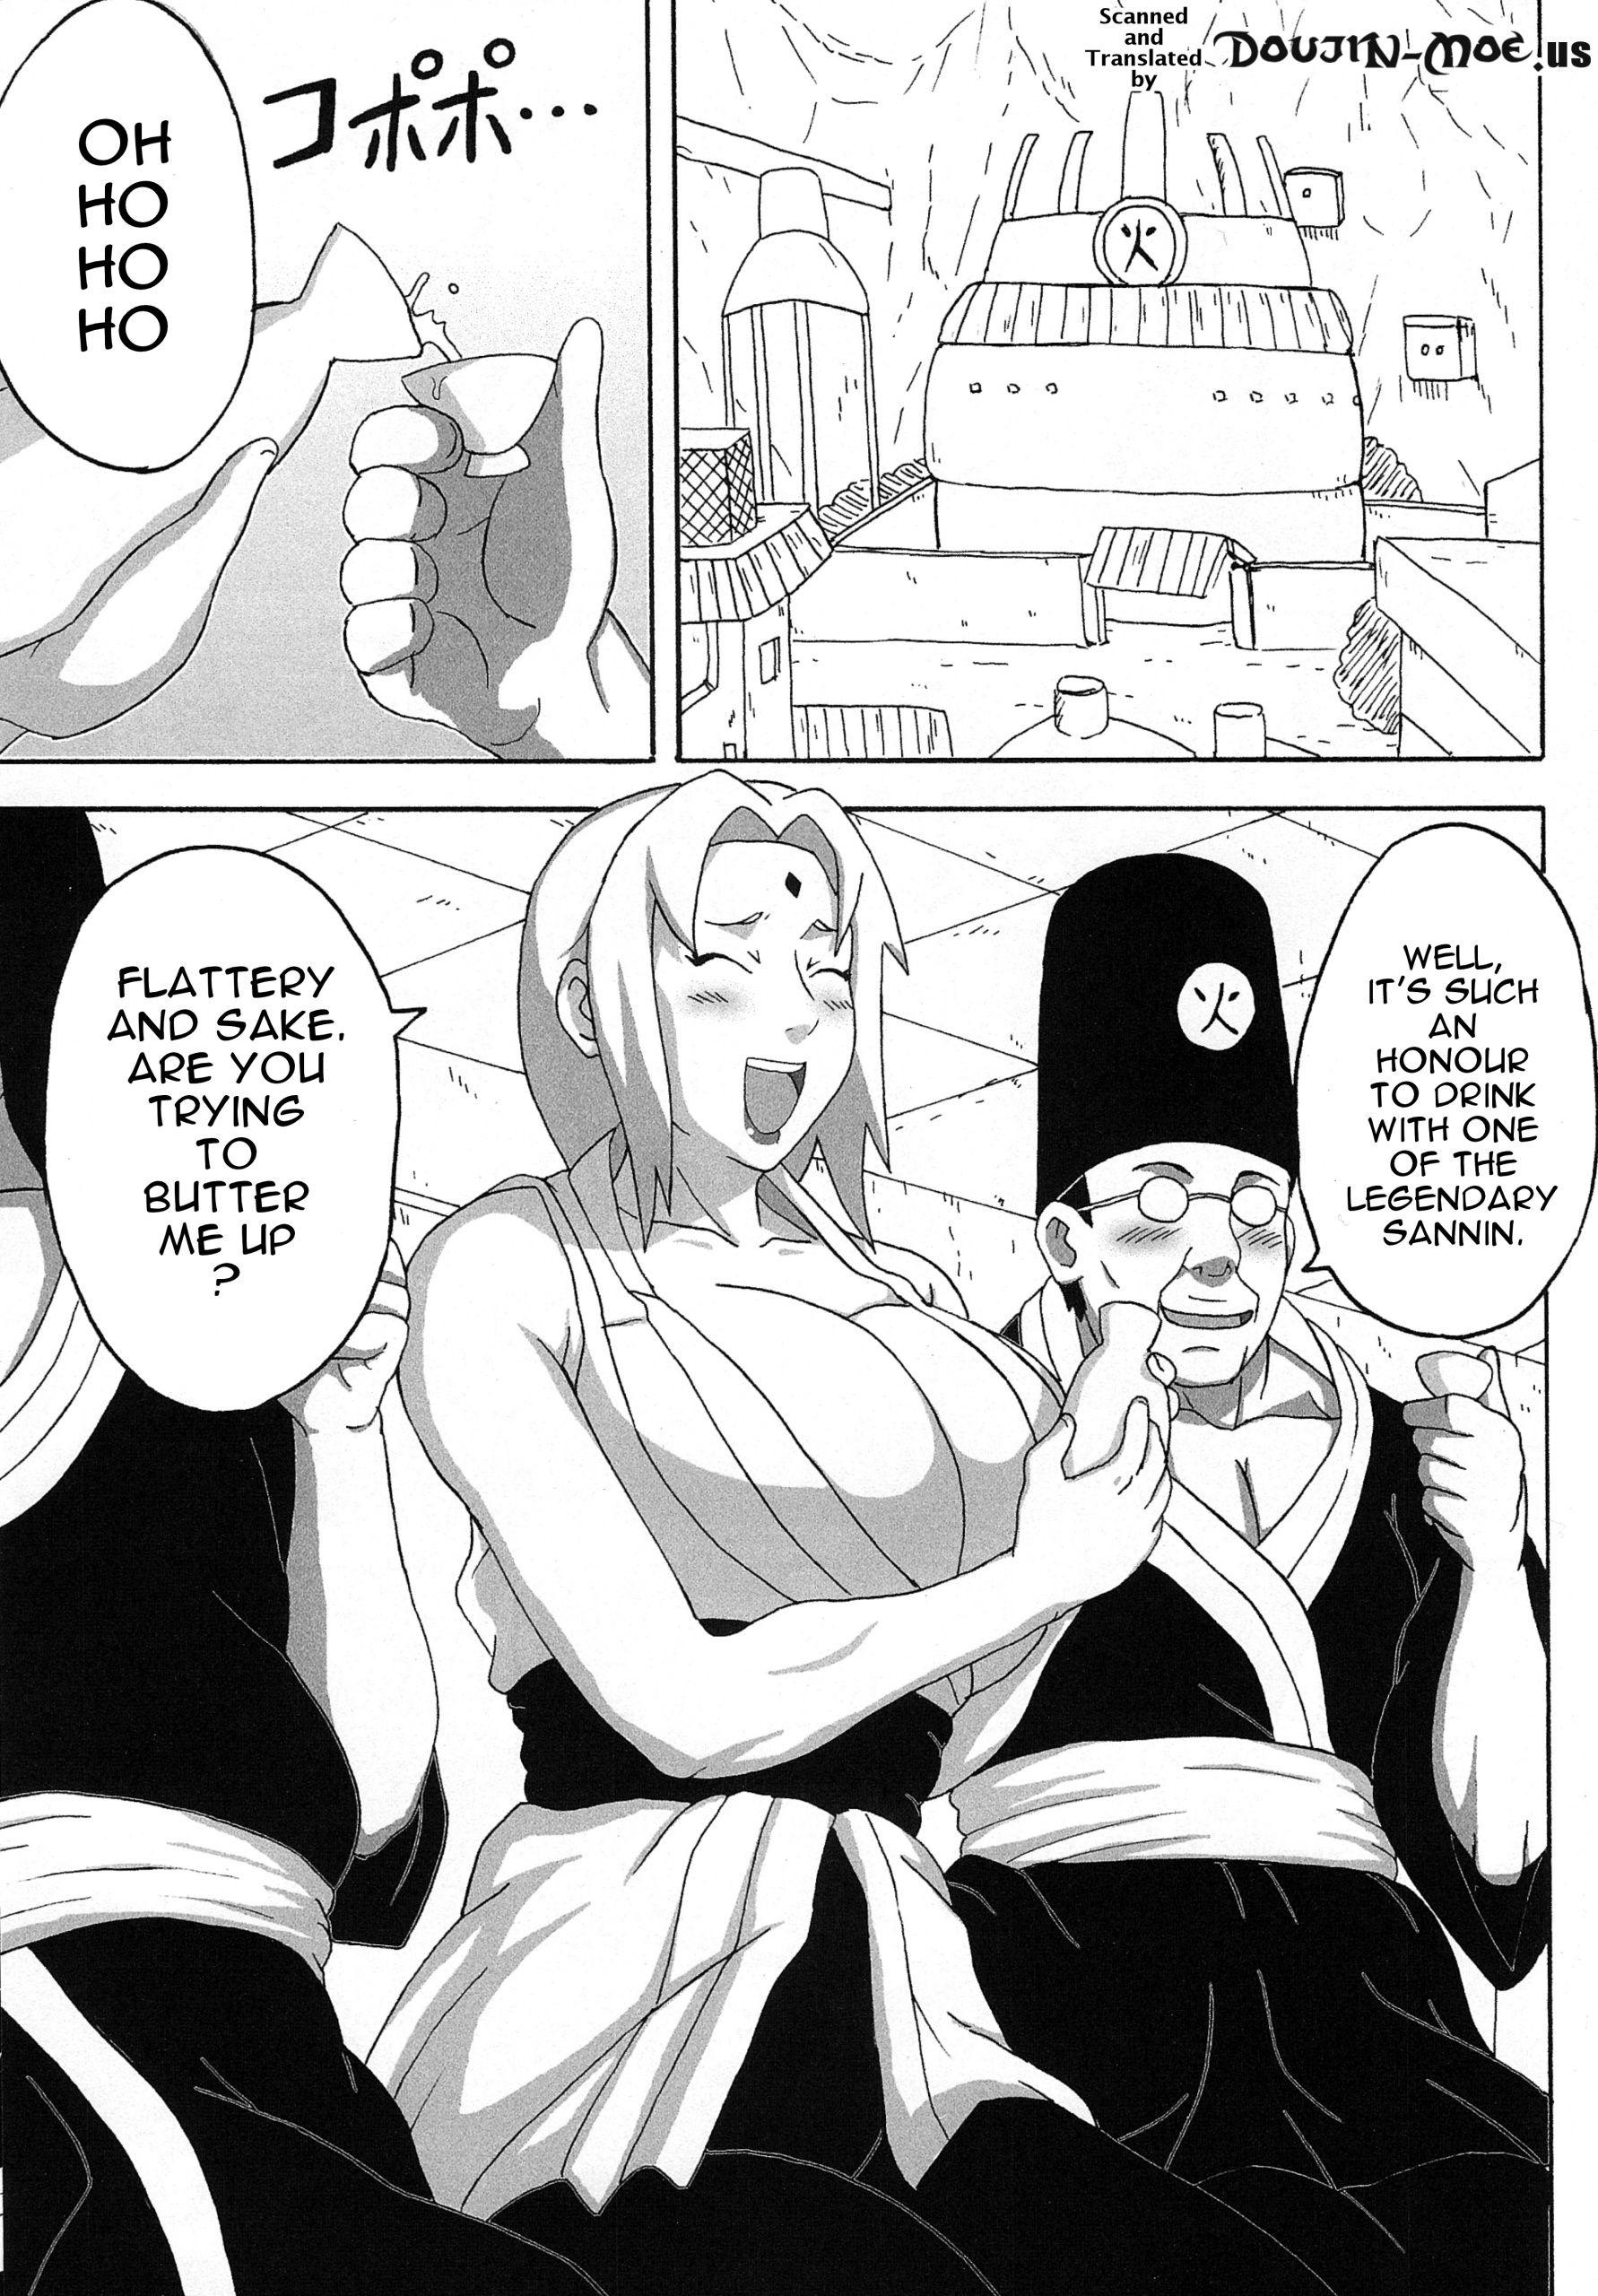 Tsunades lewd reception party hentai manga picture 2